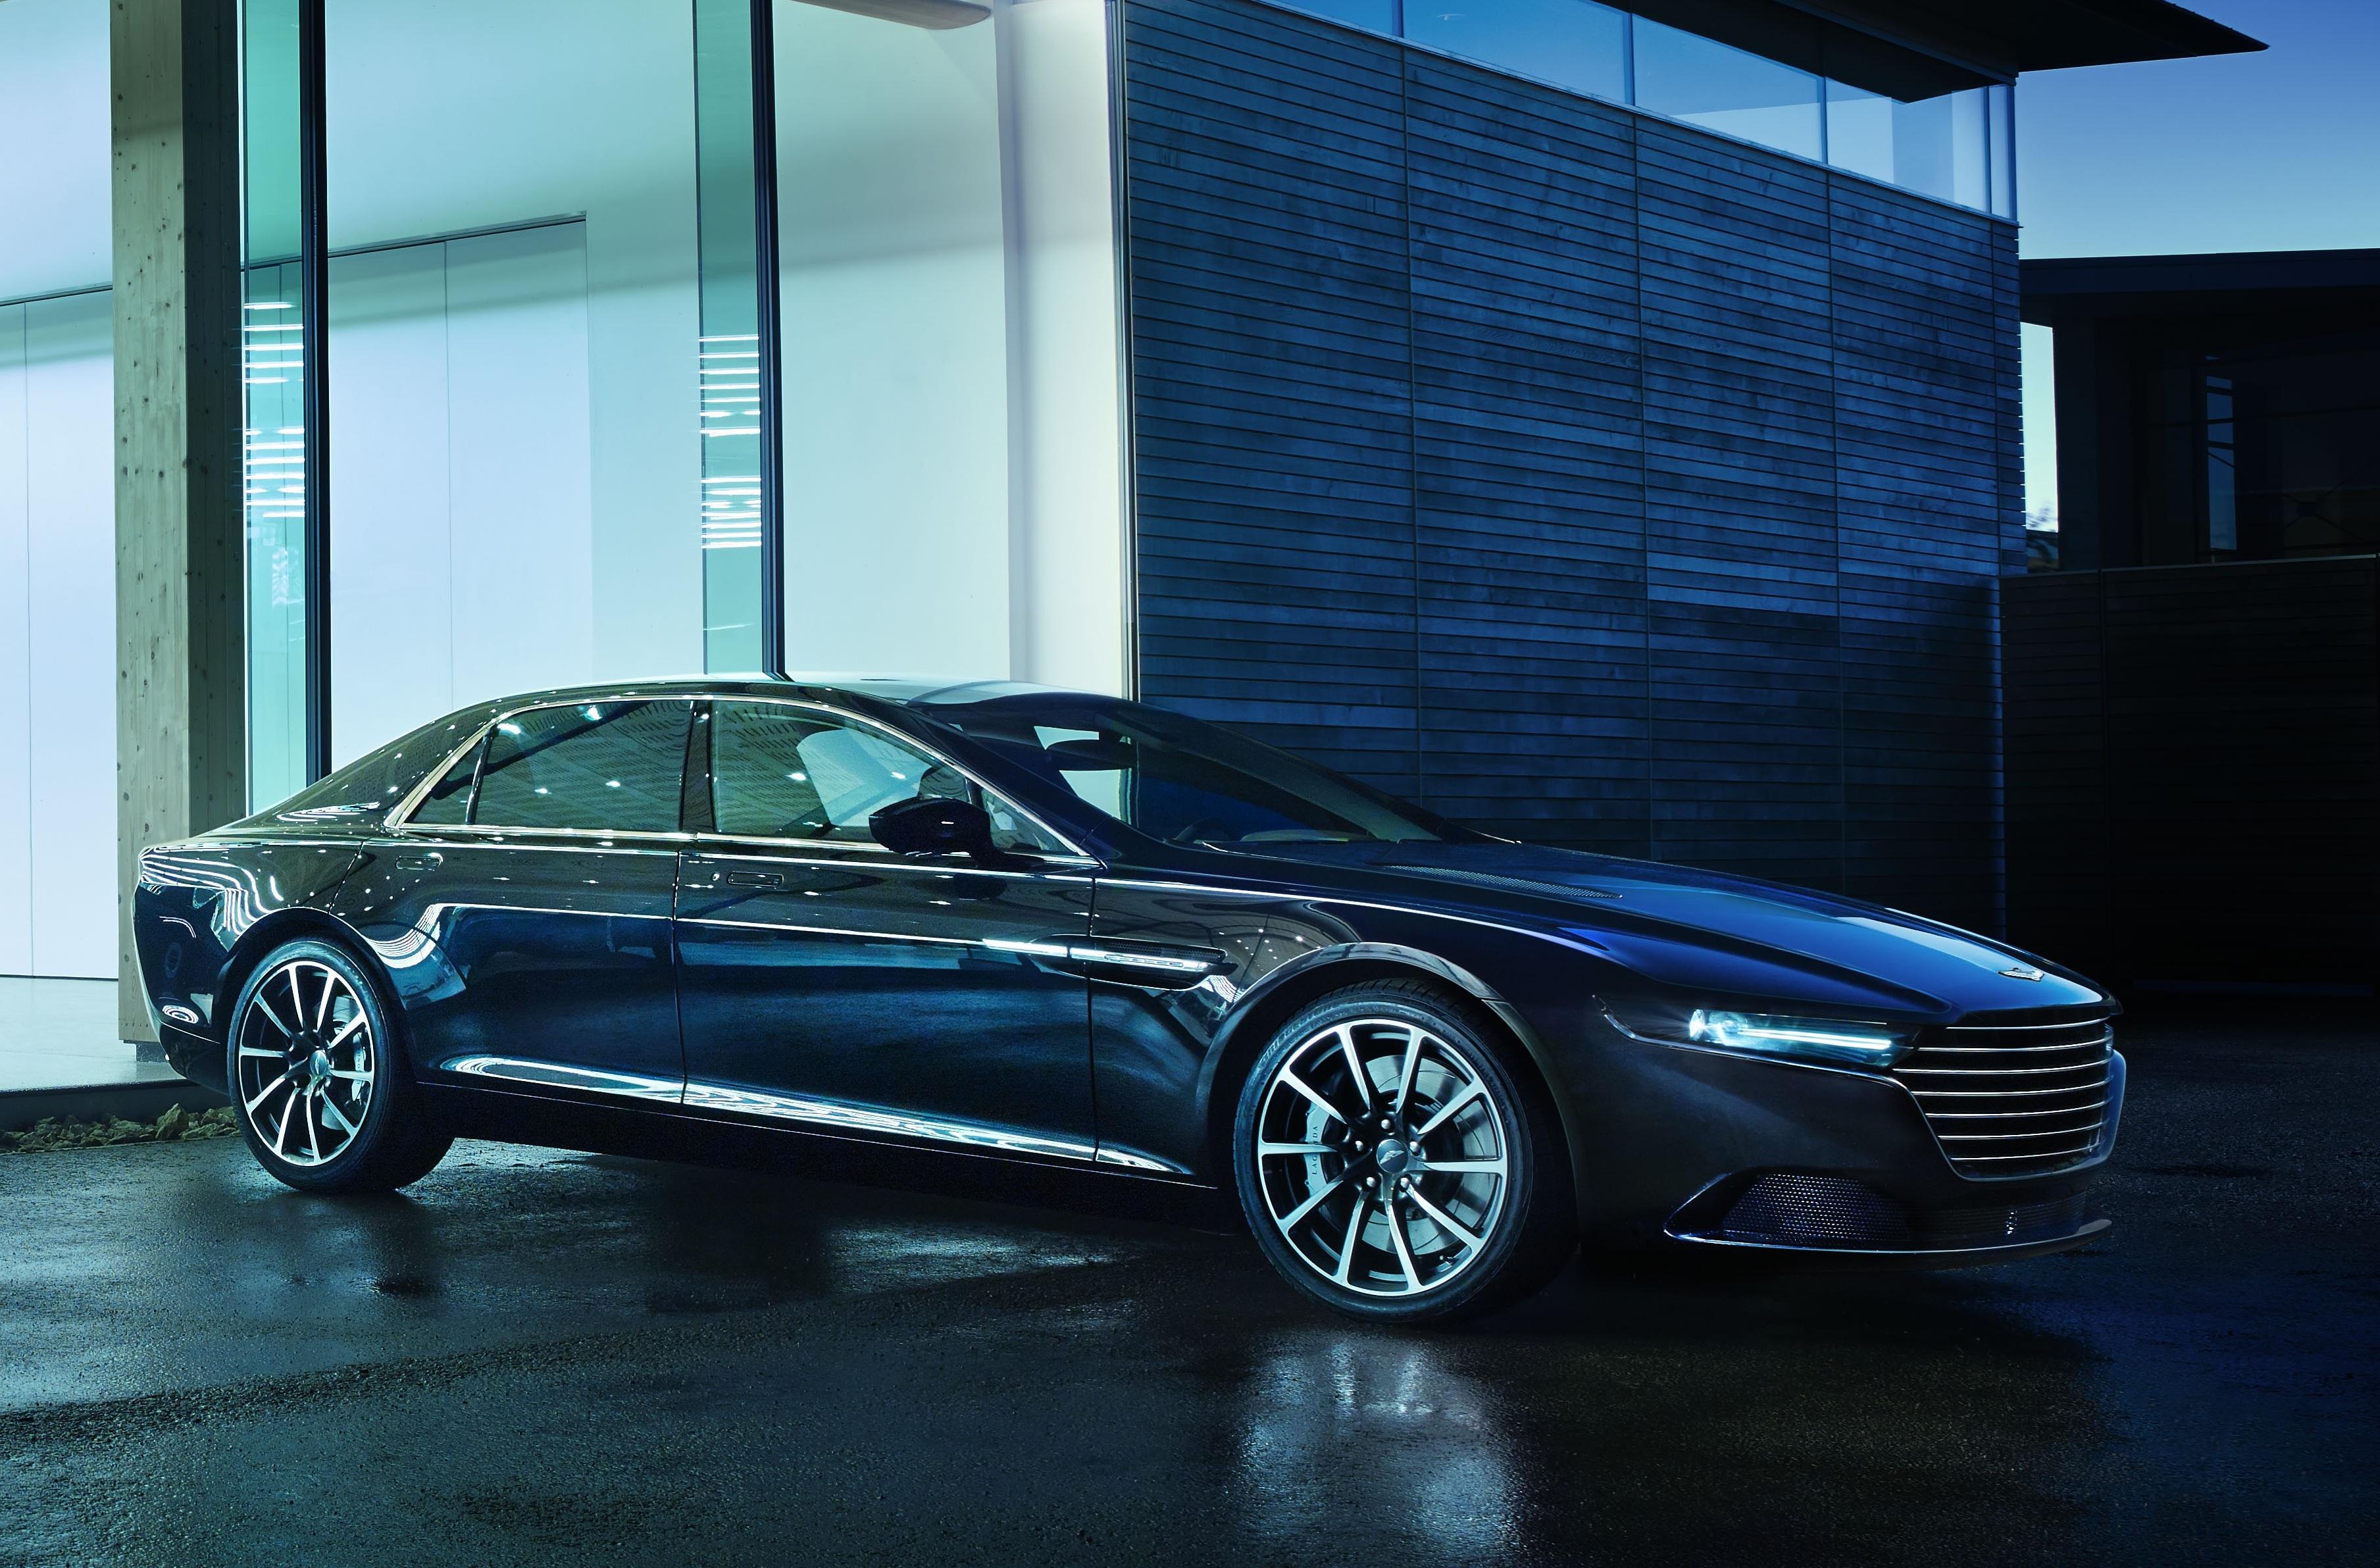 Aston Martin Lagonda Taraf Luxury Saloon Priced From 696 000 Evo